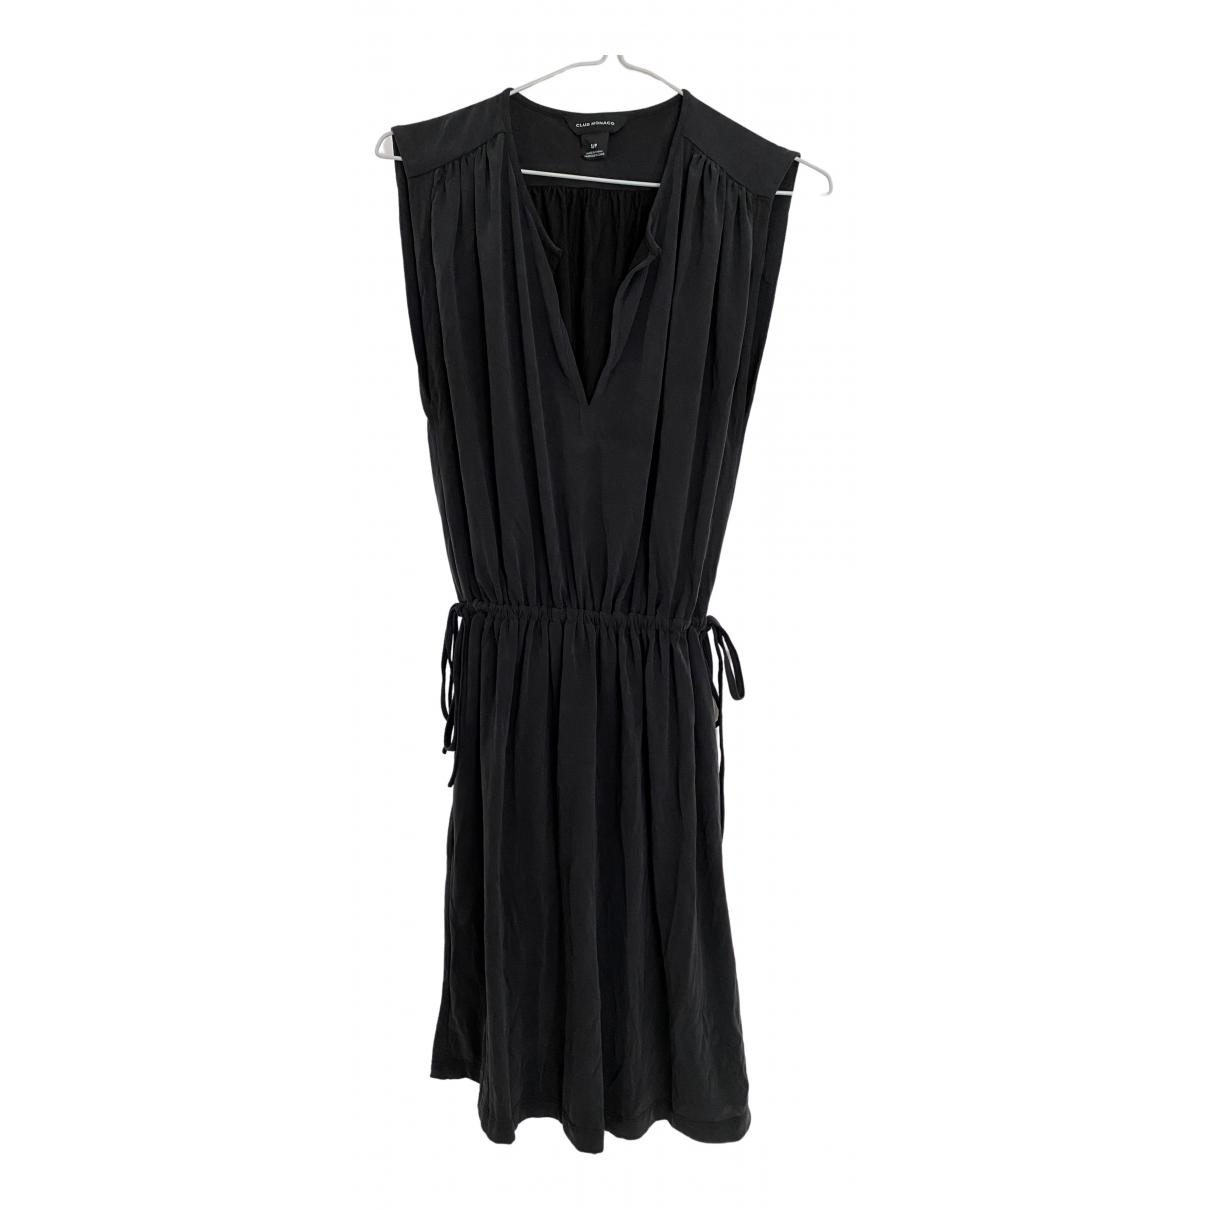 Club Monaco \N Black dress for Women S International